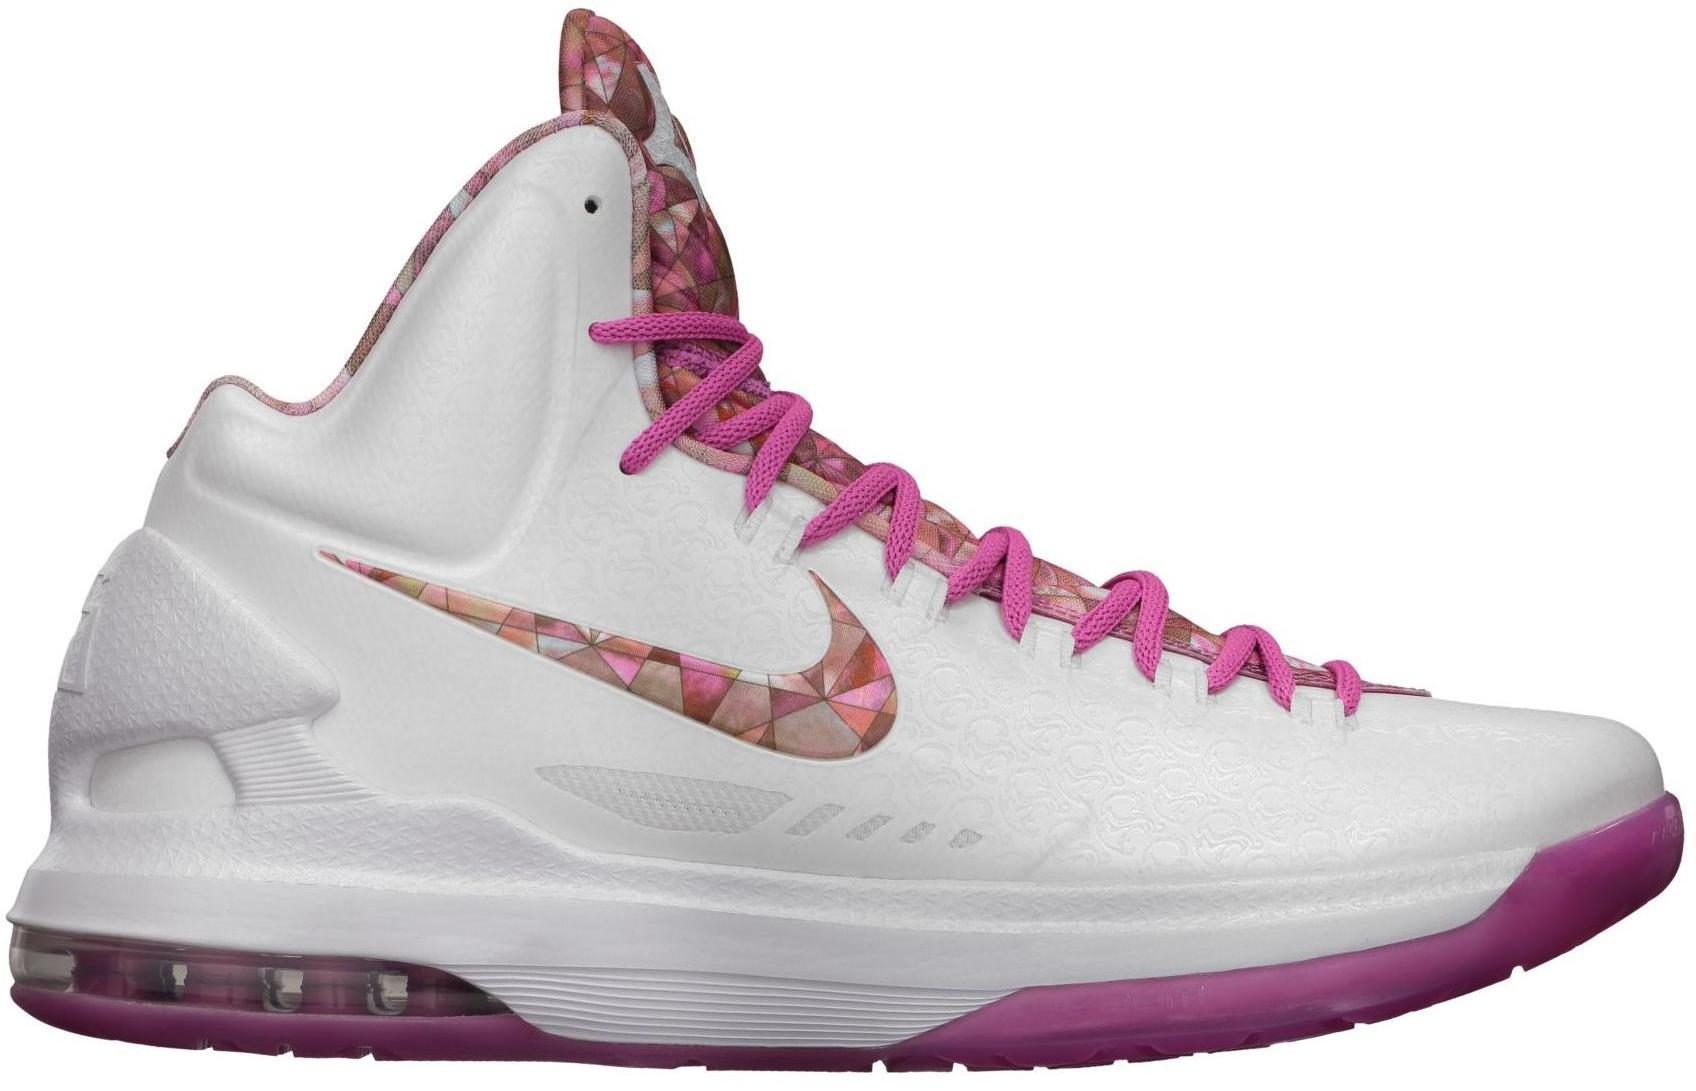 Nike KD 5 Aunt Pearl - 598601-100